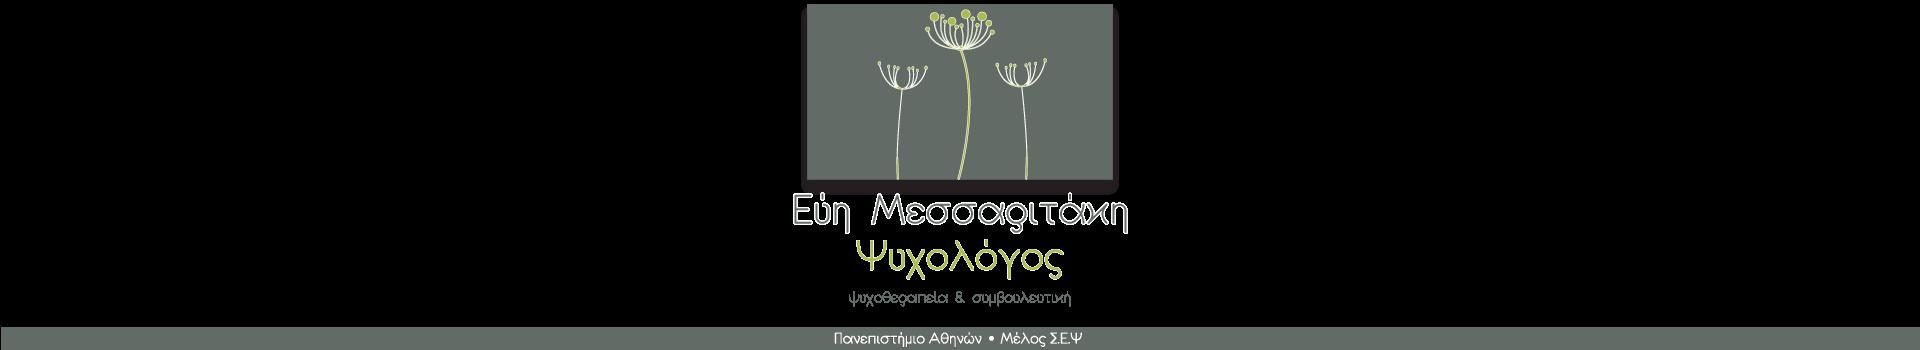 Evi-messaritaki-LogoSlide